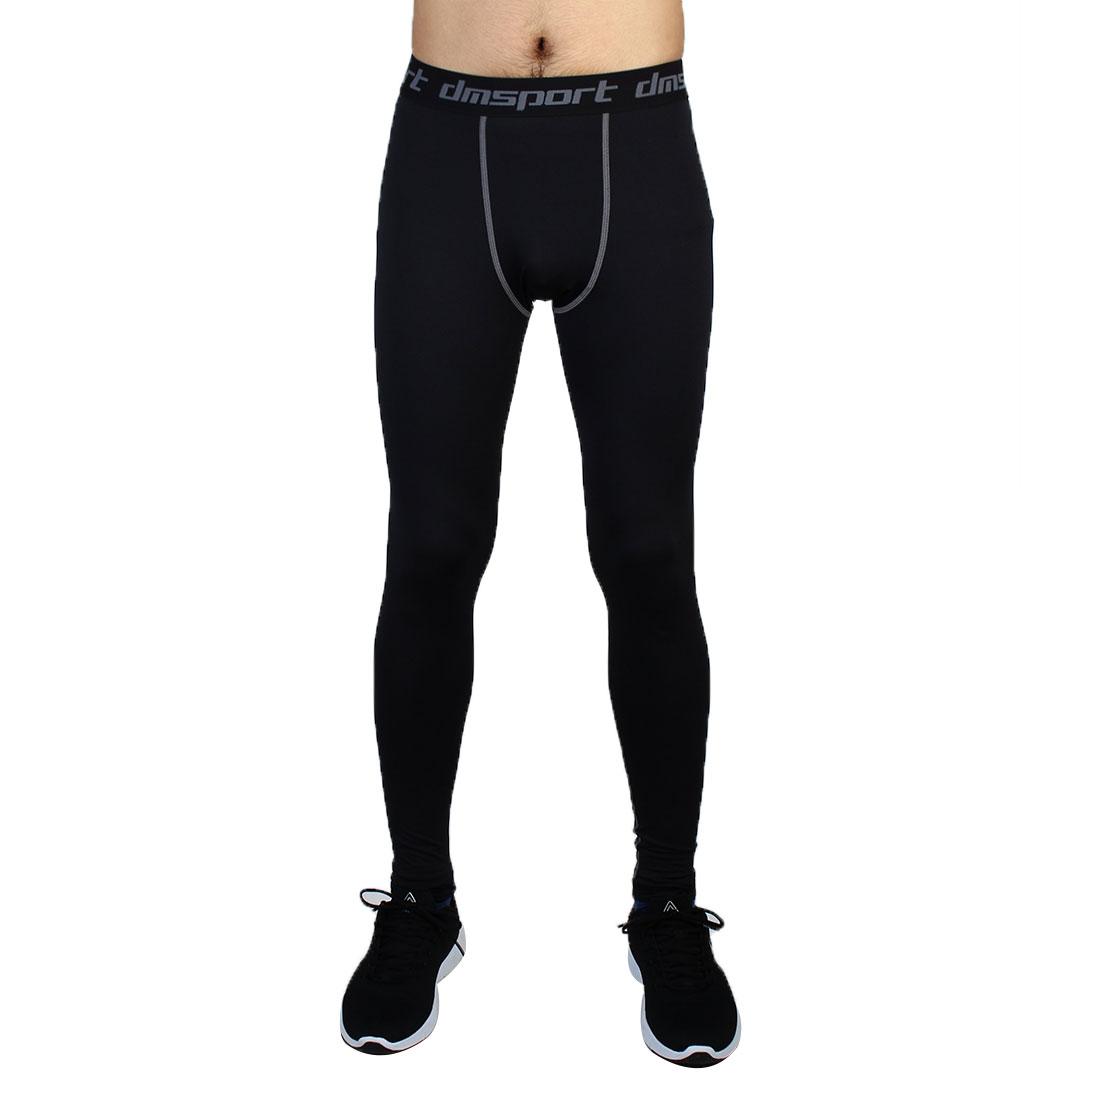 Men Sports Compression Base Layer Tights Running Long Pants Black W36